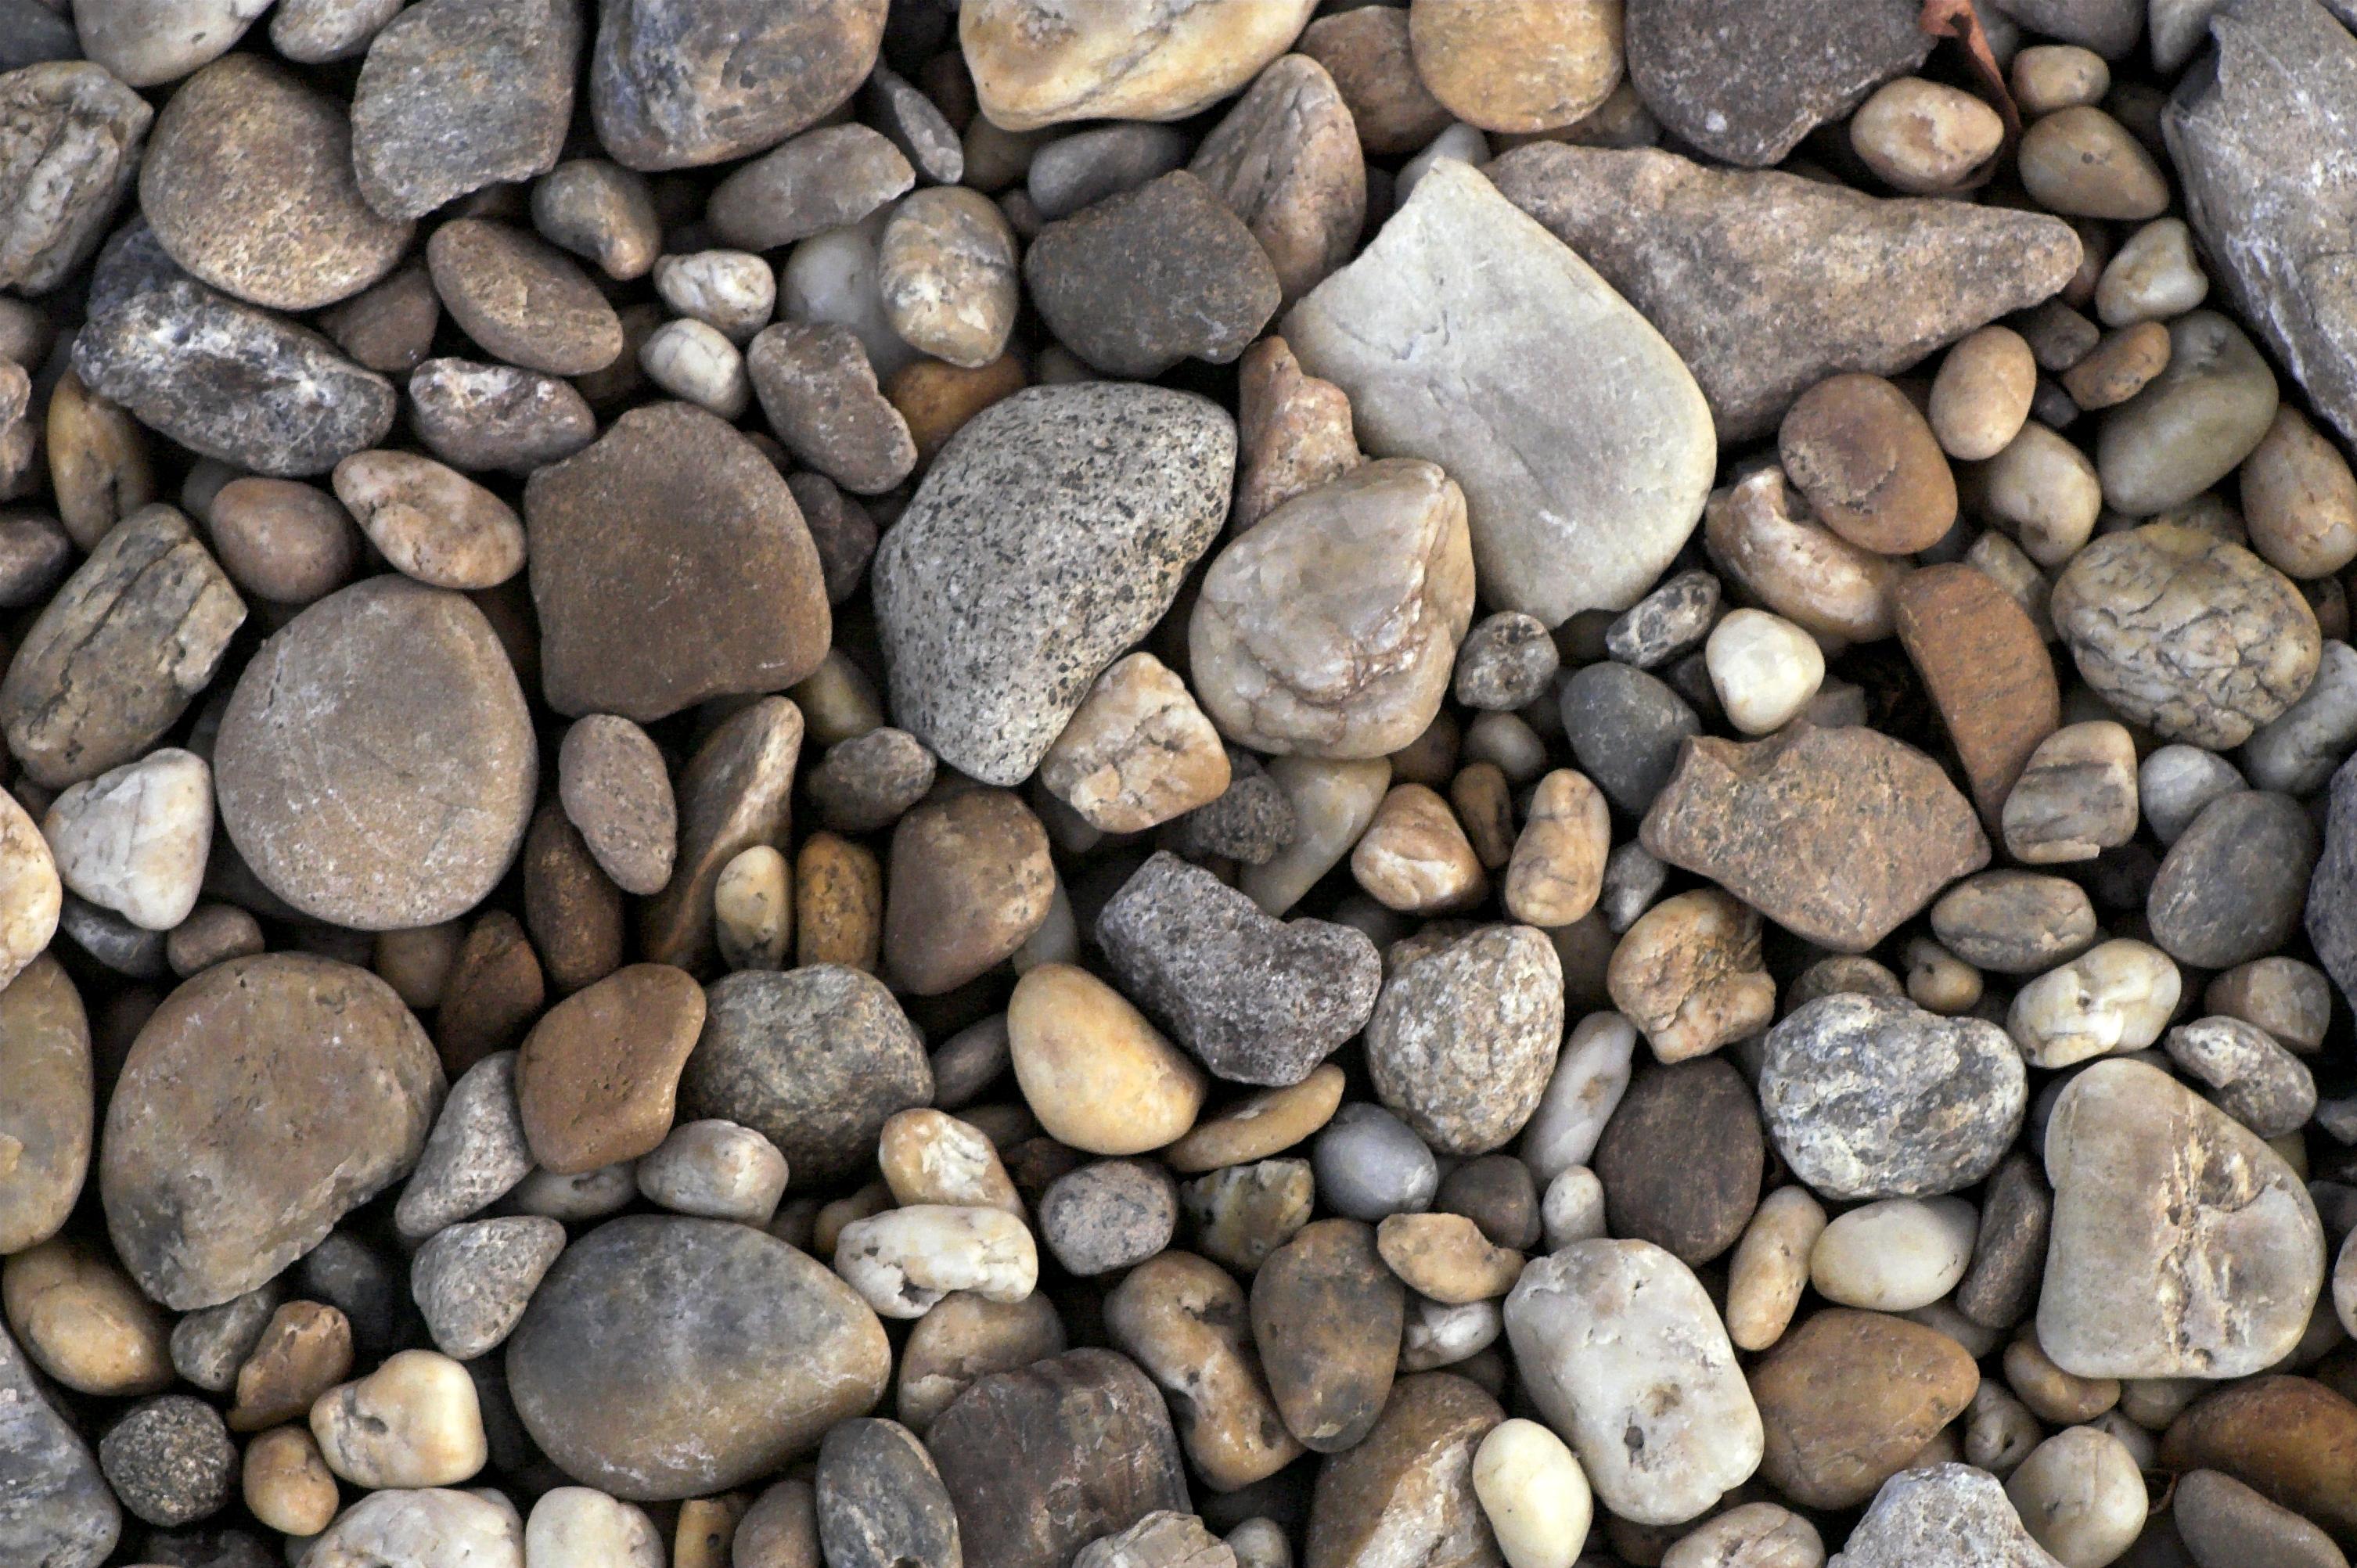 Oregon man accused of shipping $1M in marijuana in fake rocks faces ...